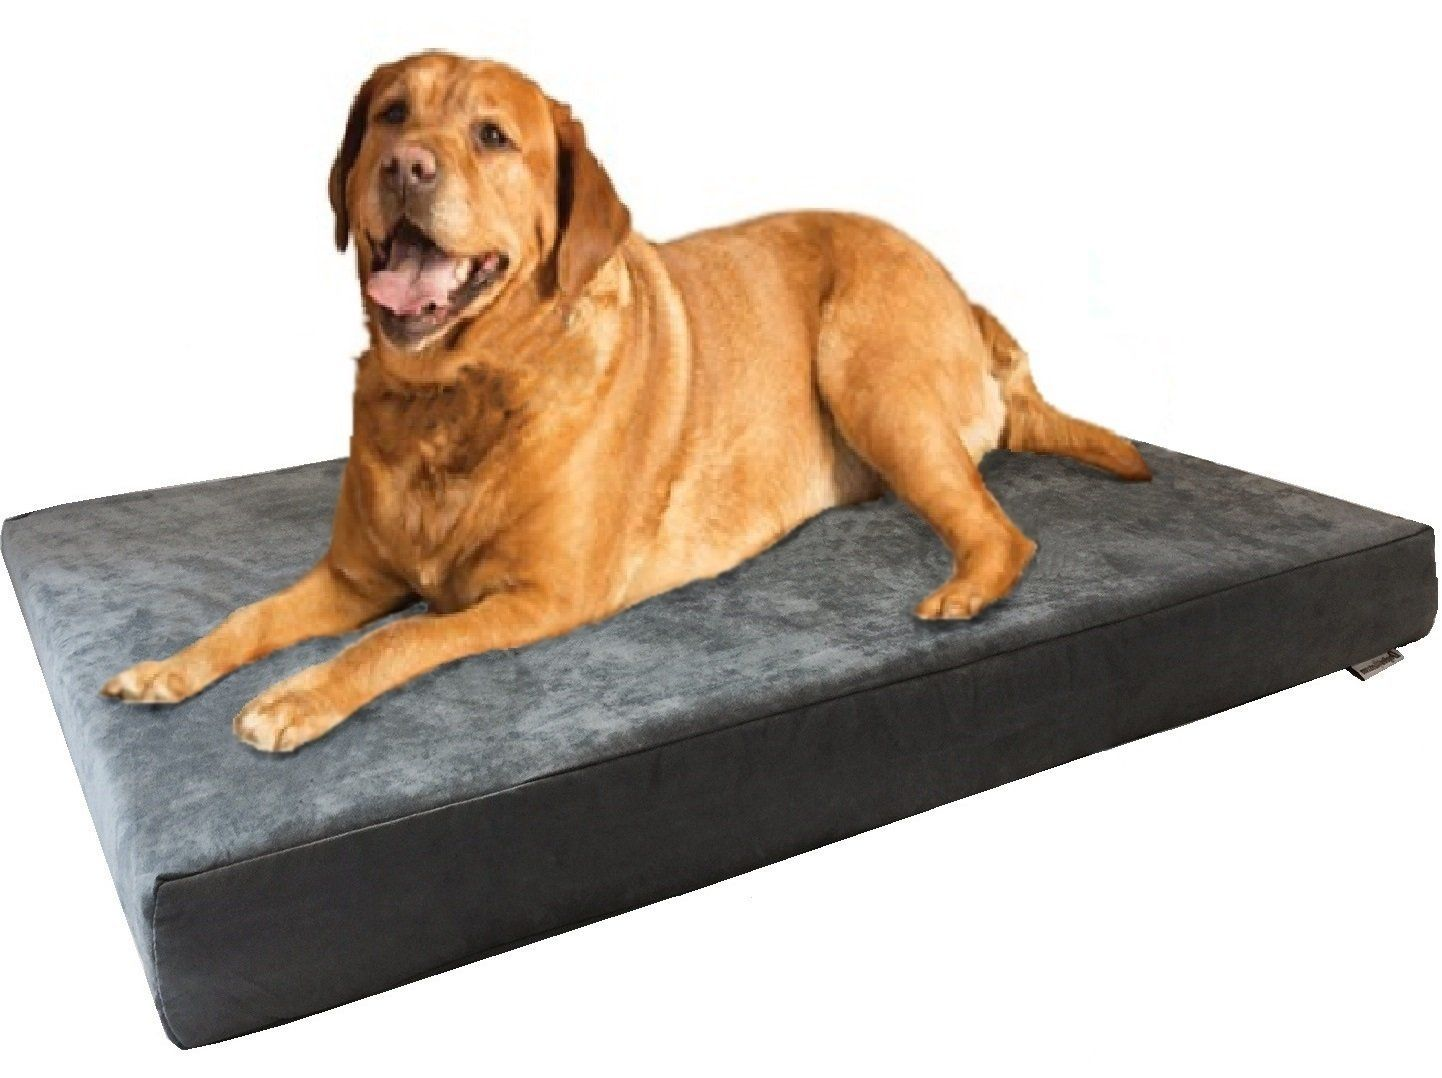 Dogbed4less Jumbo Orthopedic Gel Memory Foam Pet Bed with